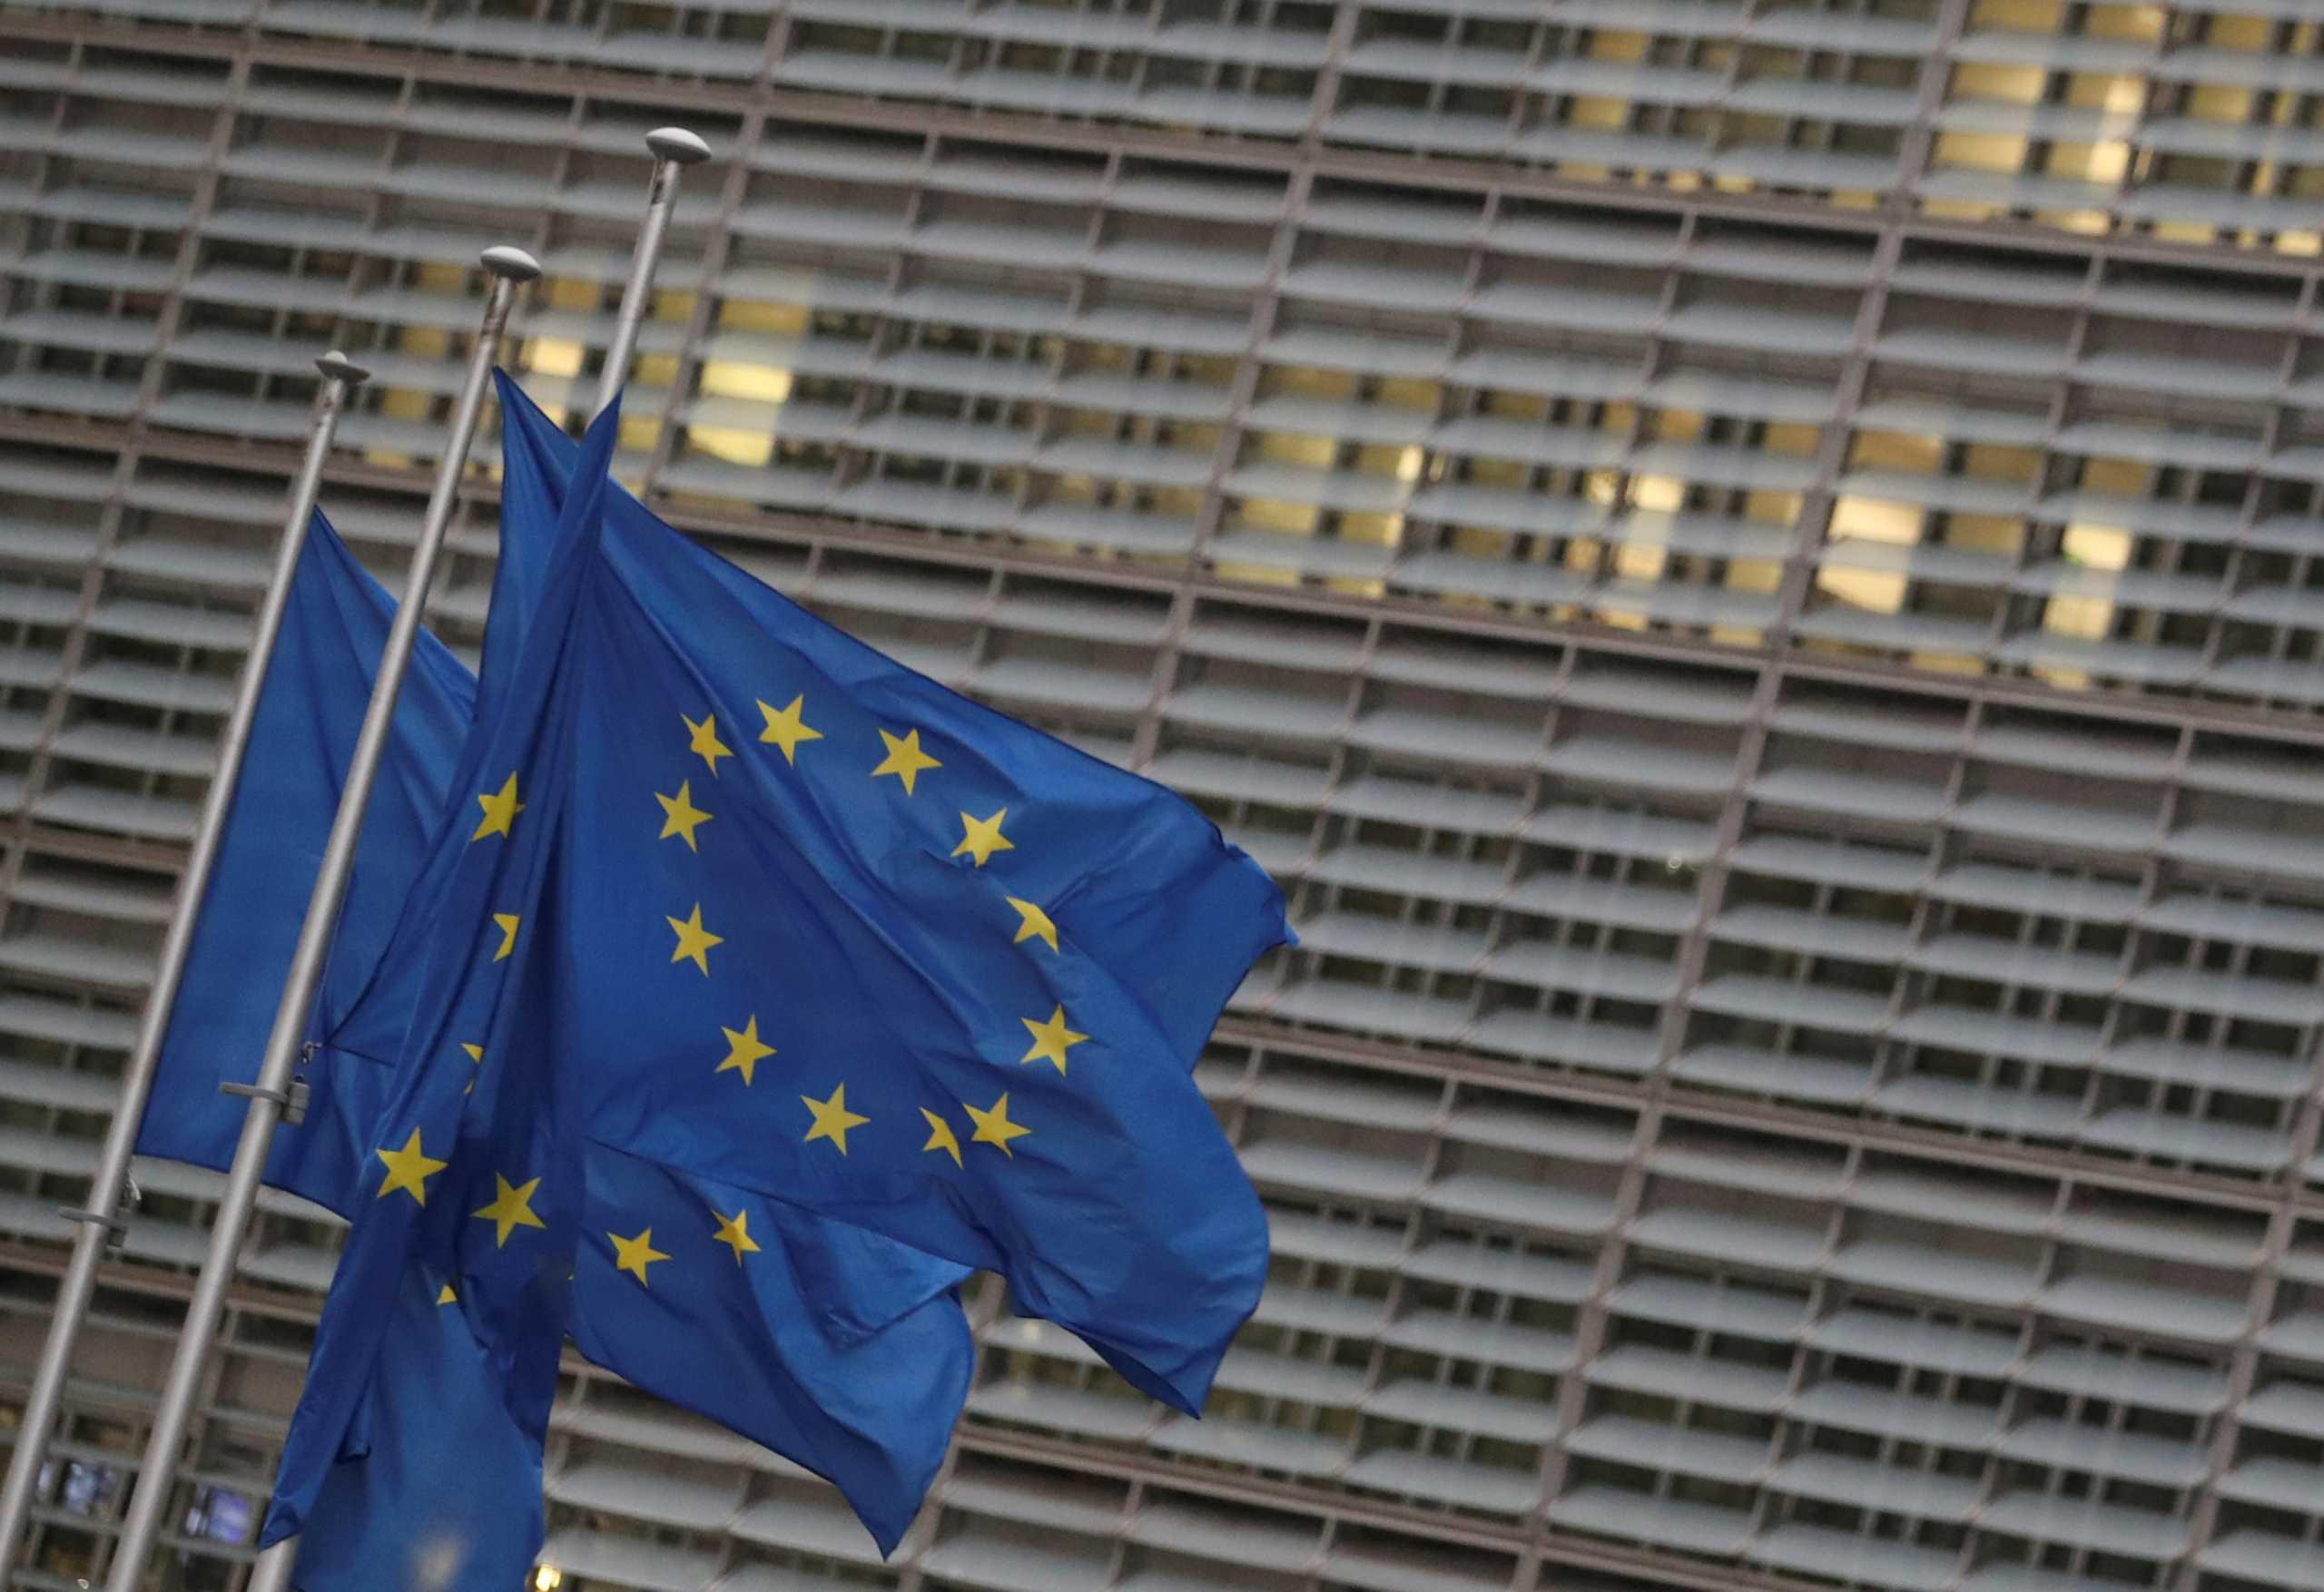 Brexit: «Η Βρετανία παραβίασε τις συμφωνίες του διαζυγίου» – Η απάντηση του Ευρωπαϊκού Κοινοβουλίου